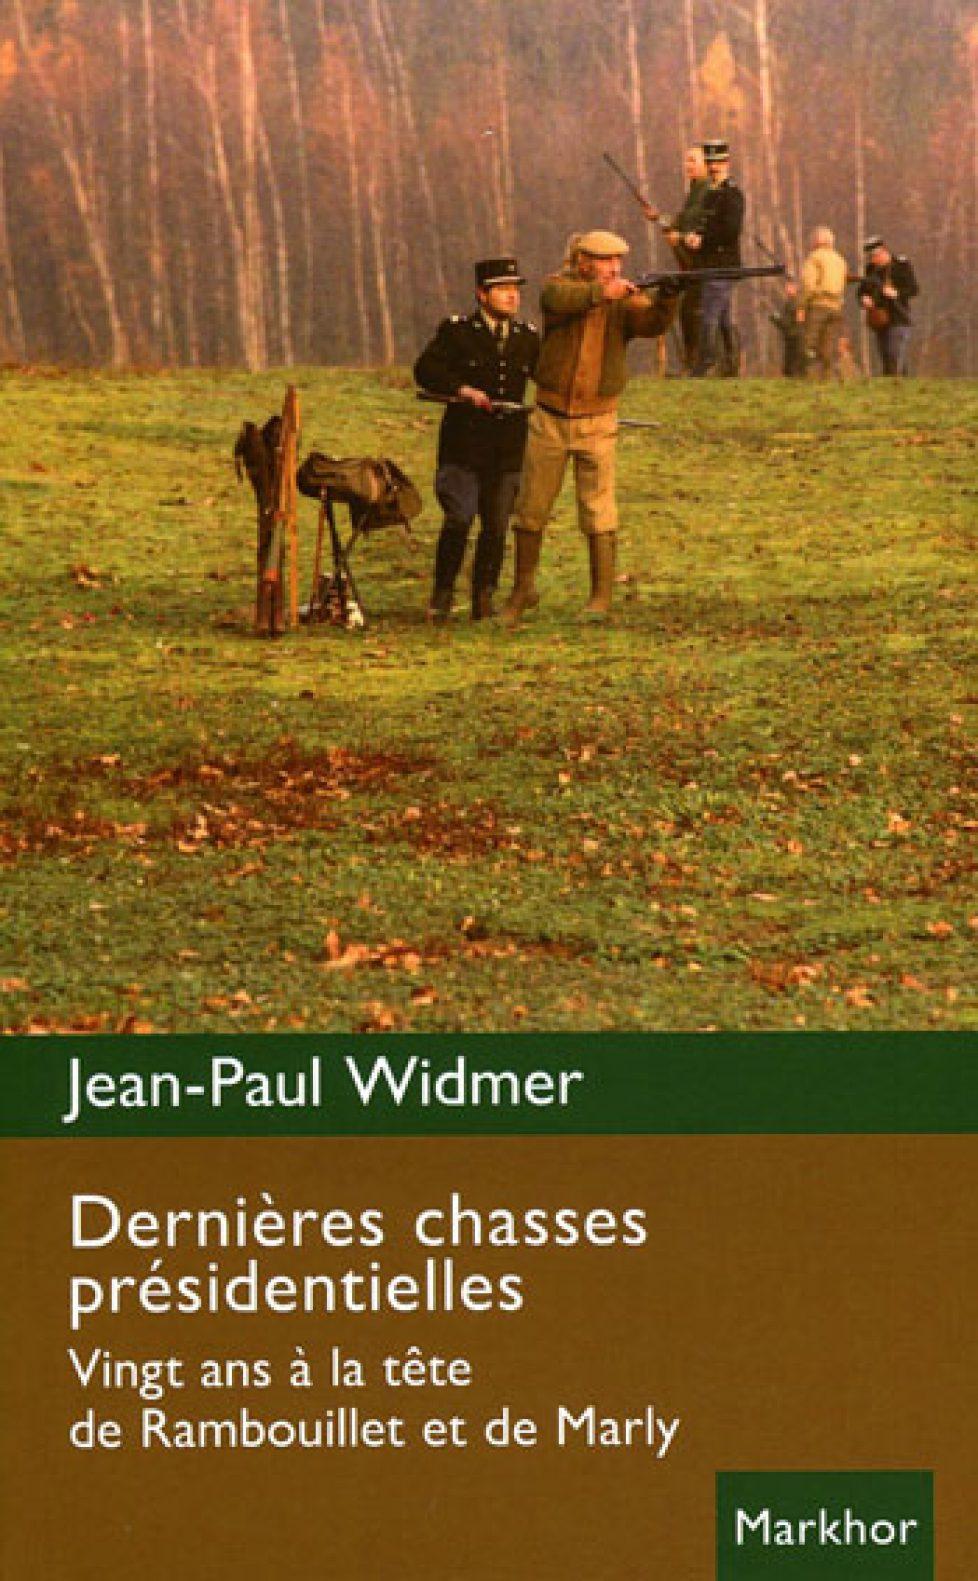 widmer-dernieres-chasses097-z